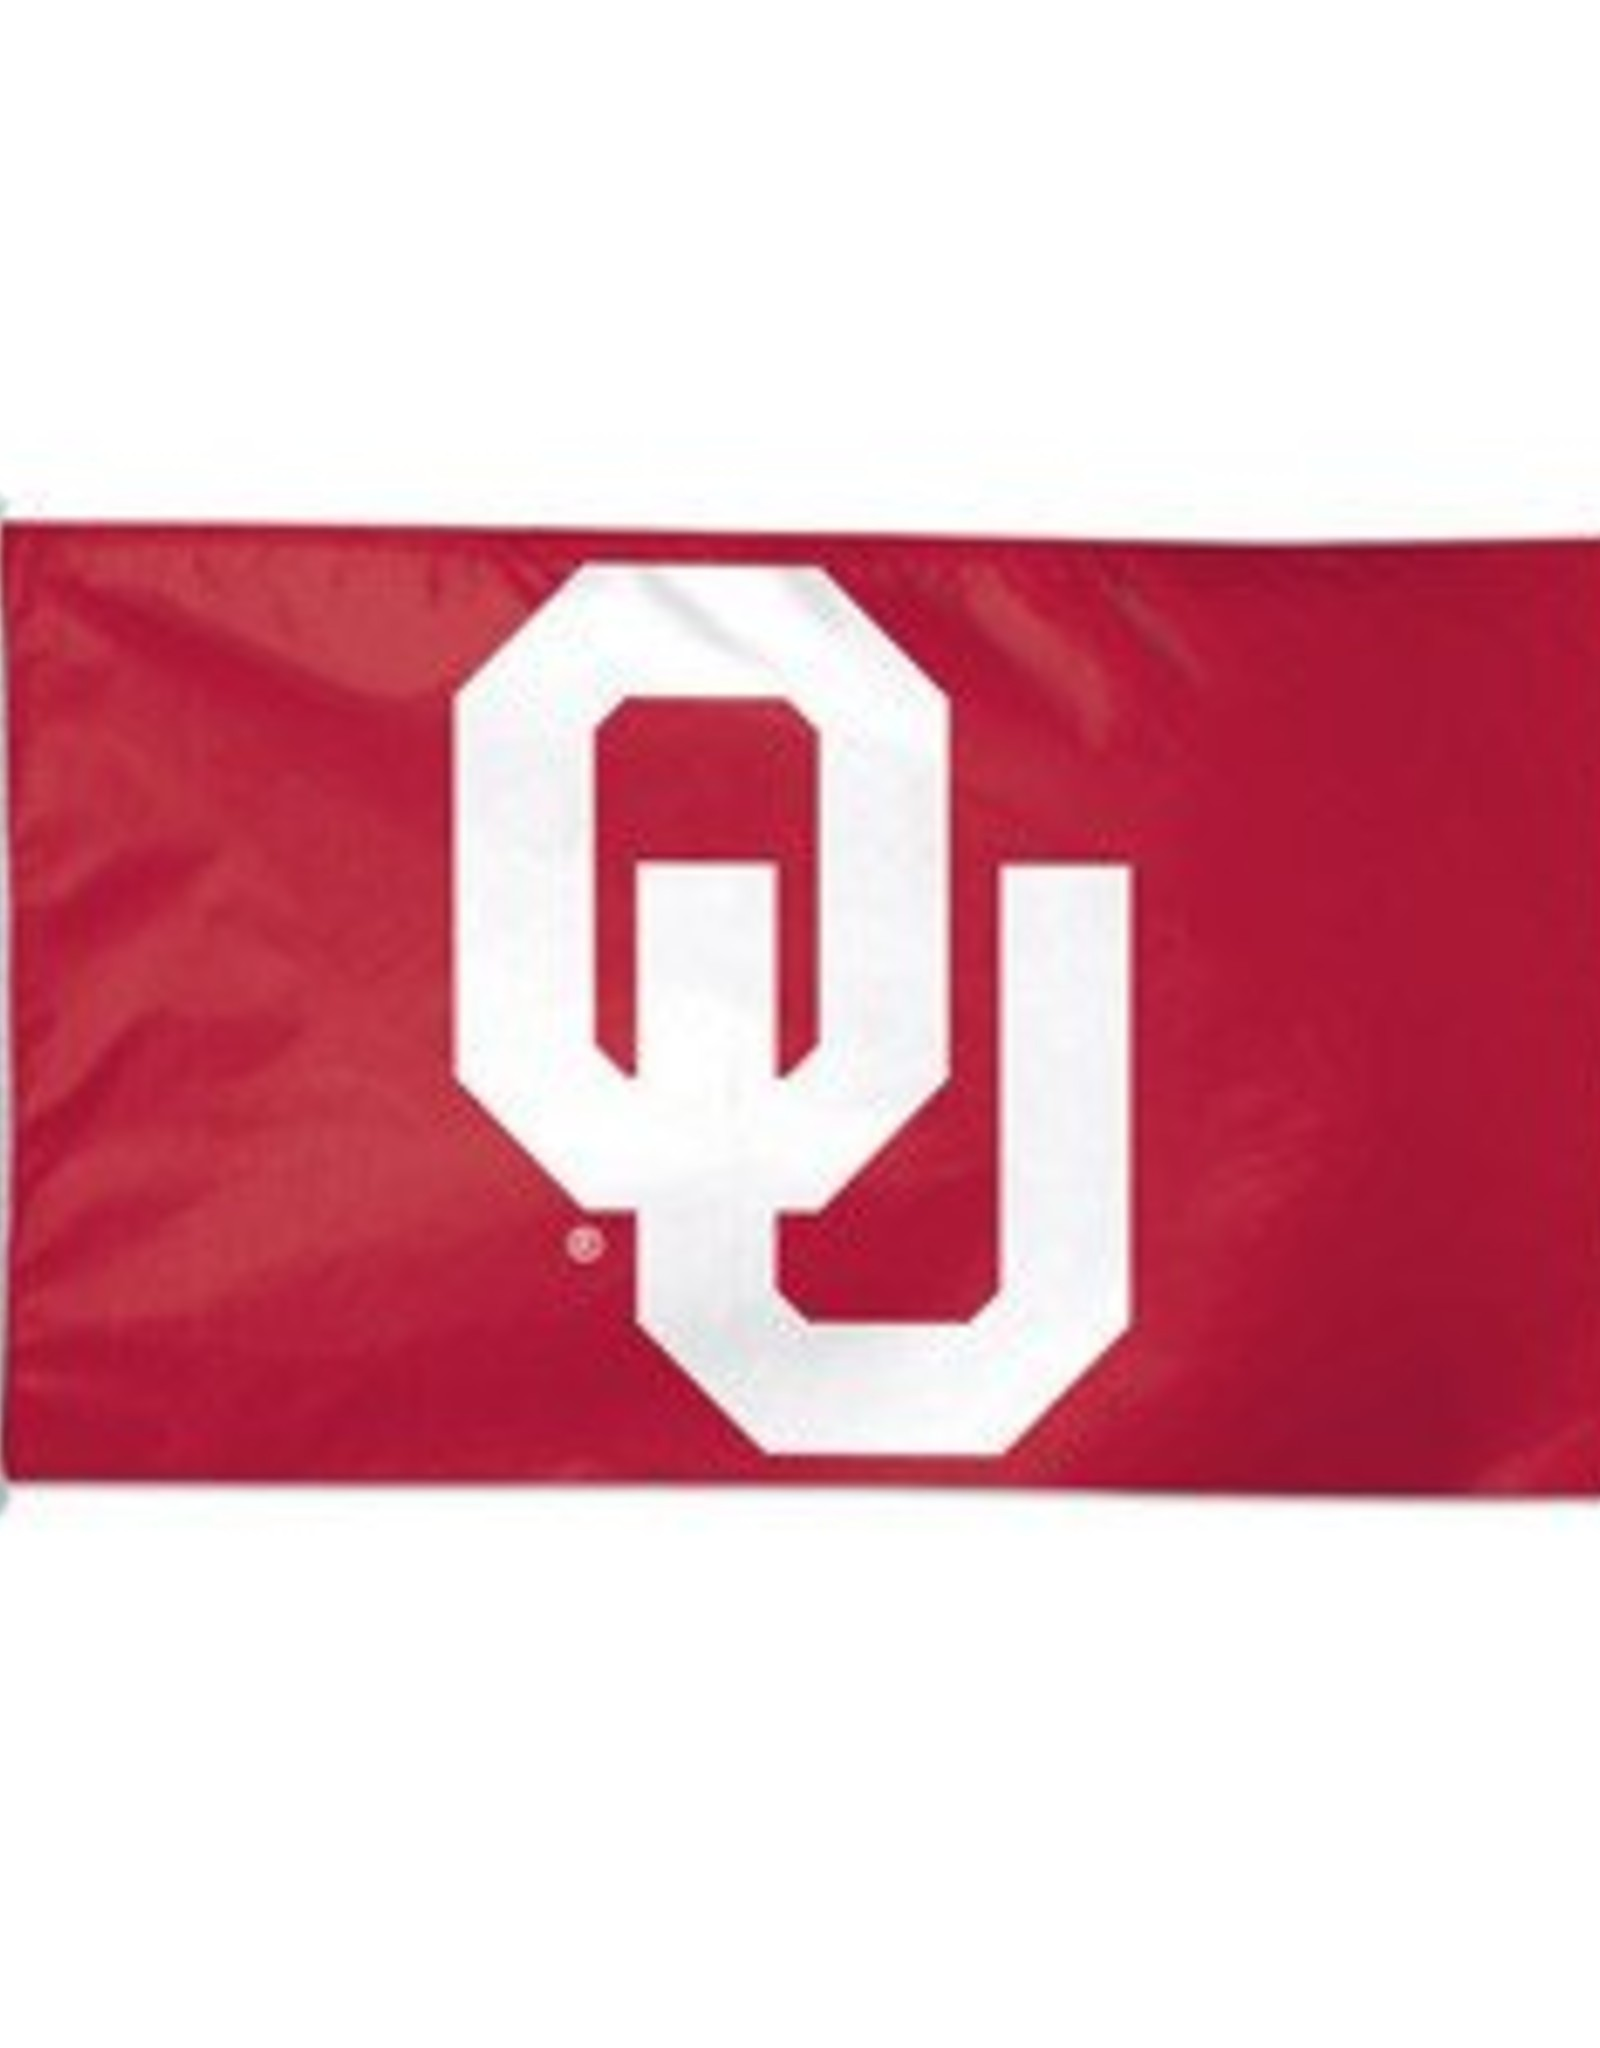 Sewing Concepts OU Crimson/White 3'x5' Applique Double-Sided Flag (AB)